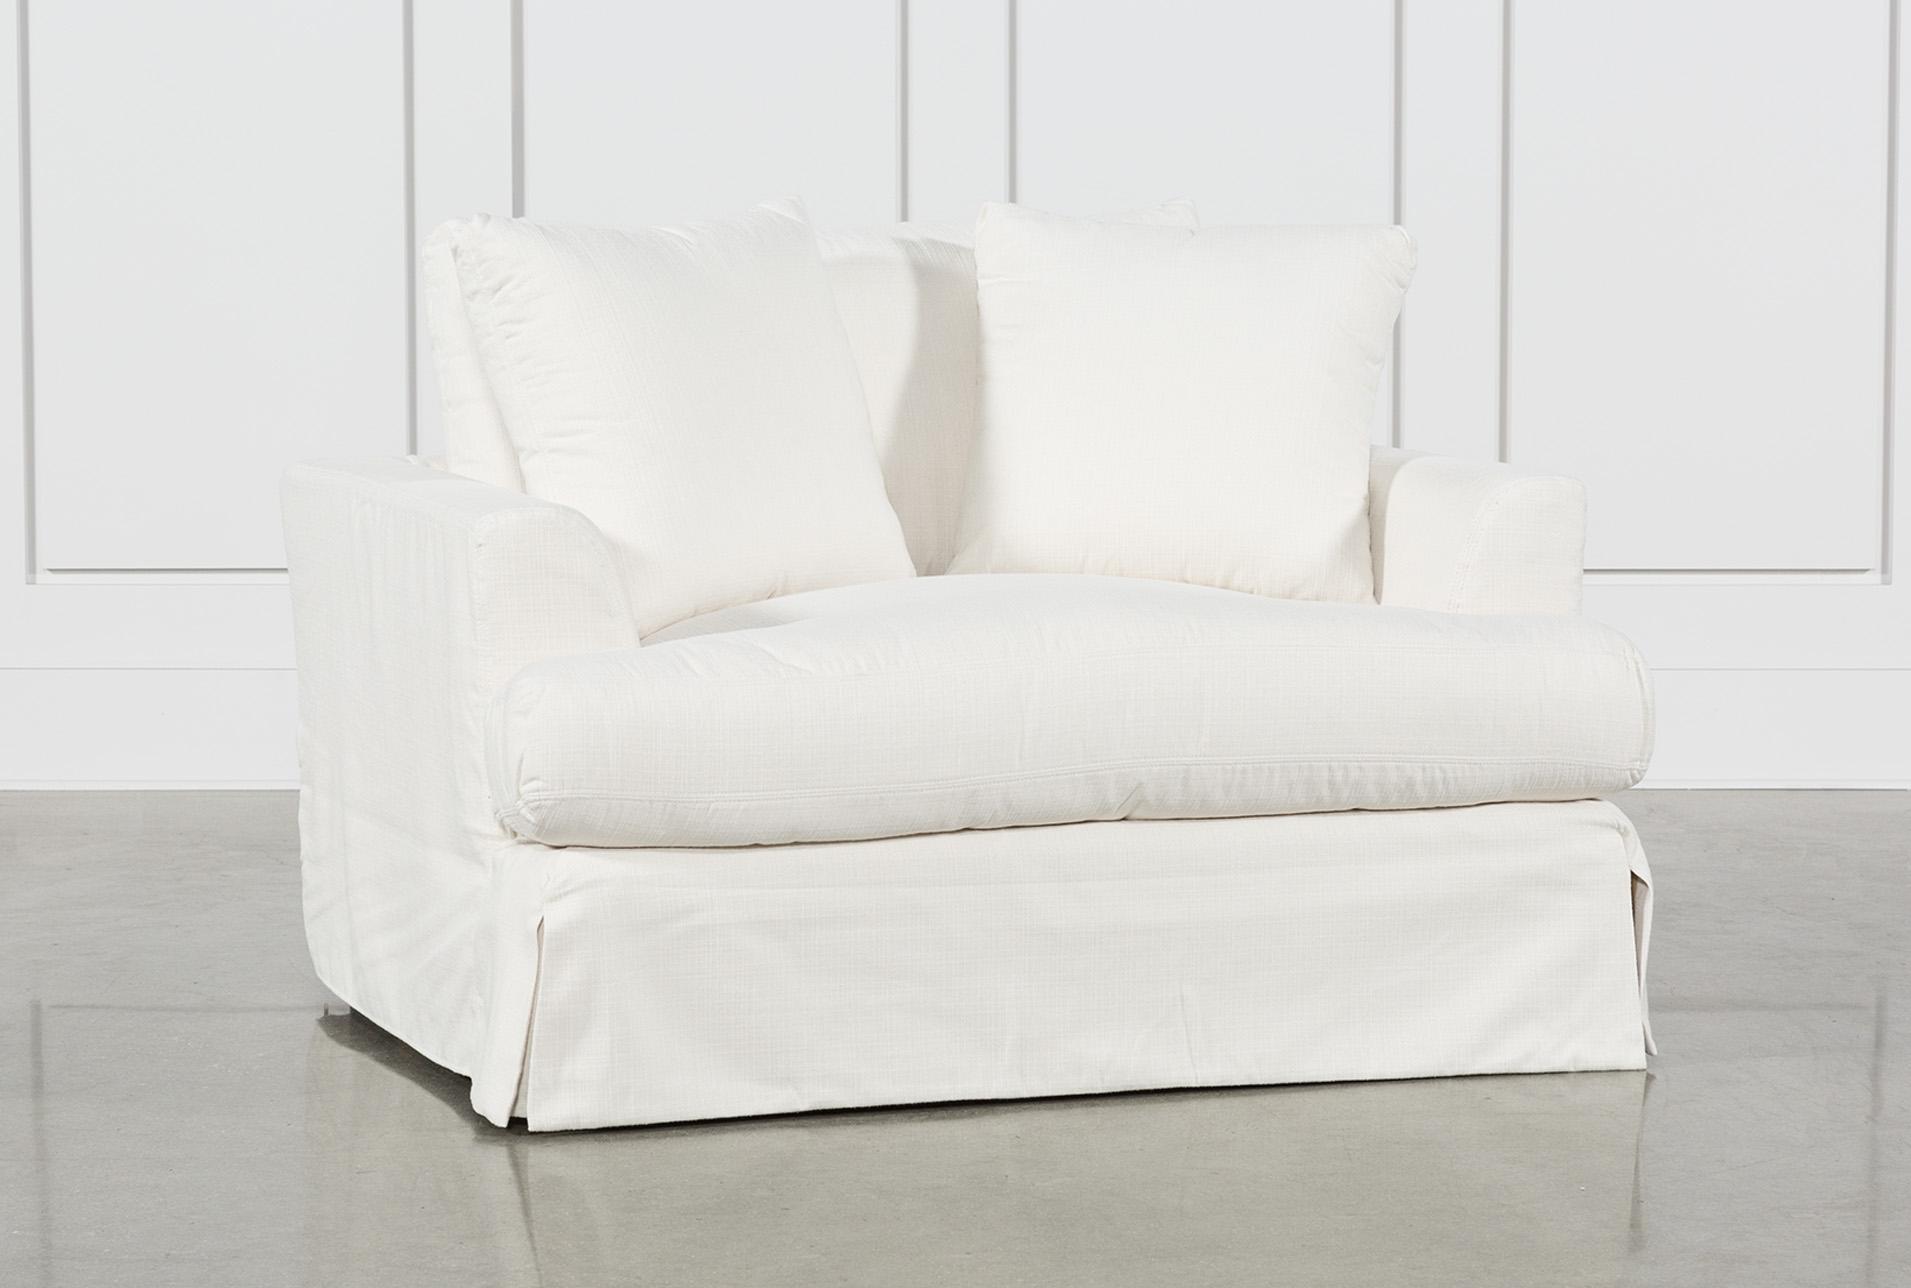 Attirant Solano Slipcovered Oversized Chair   360